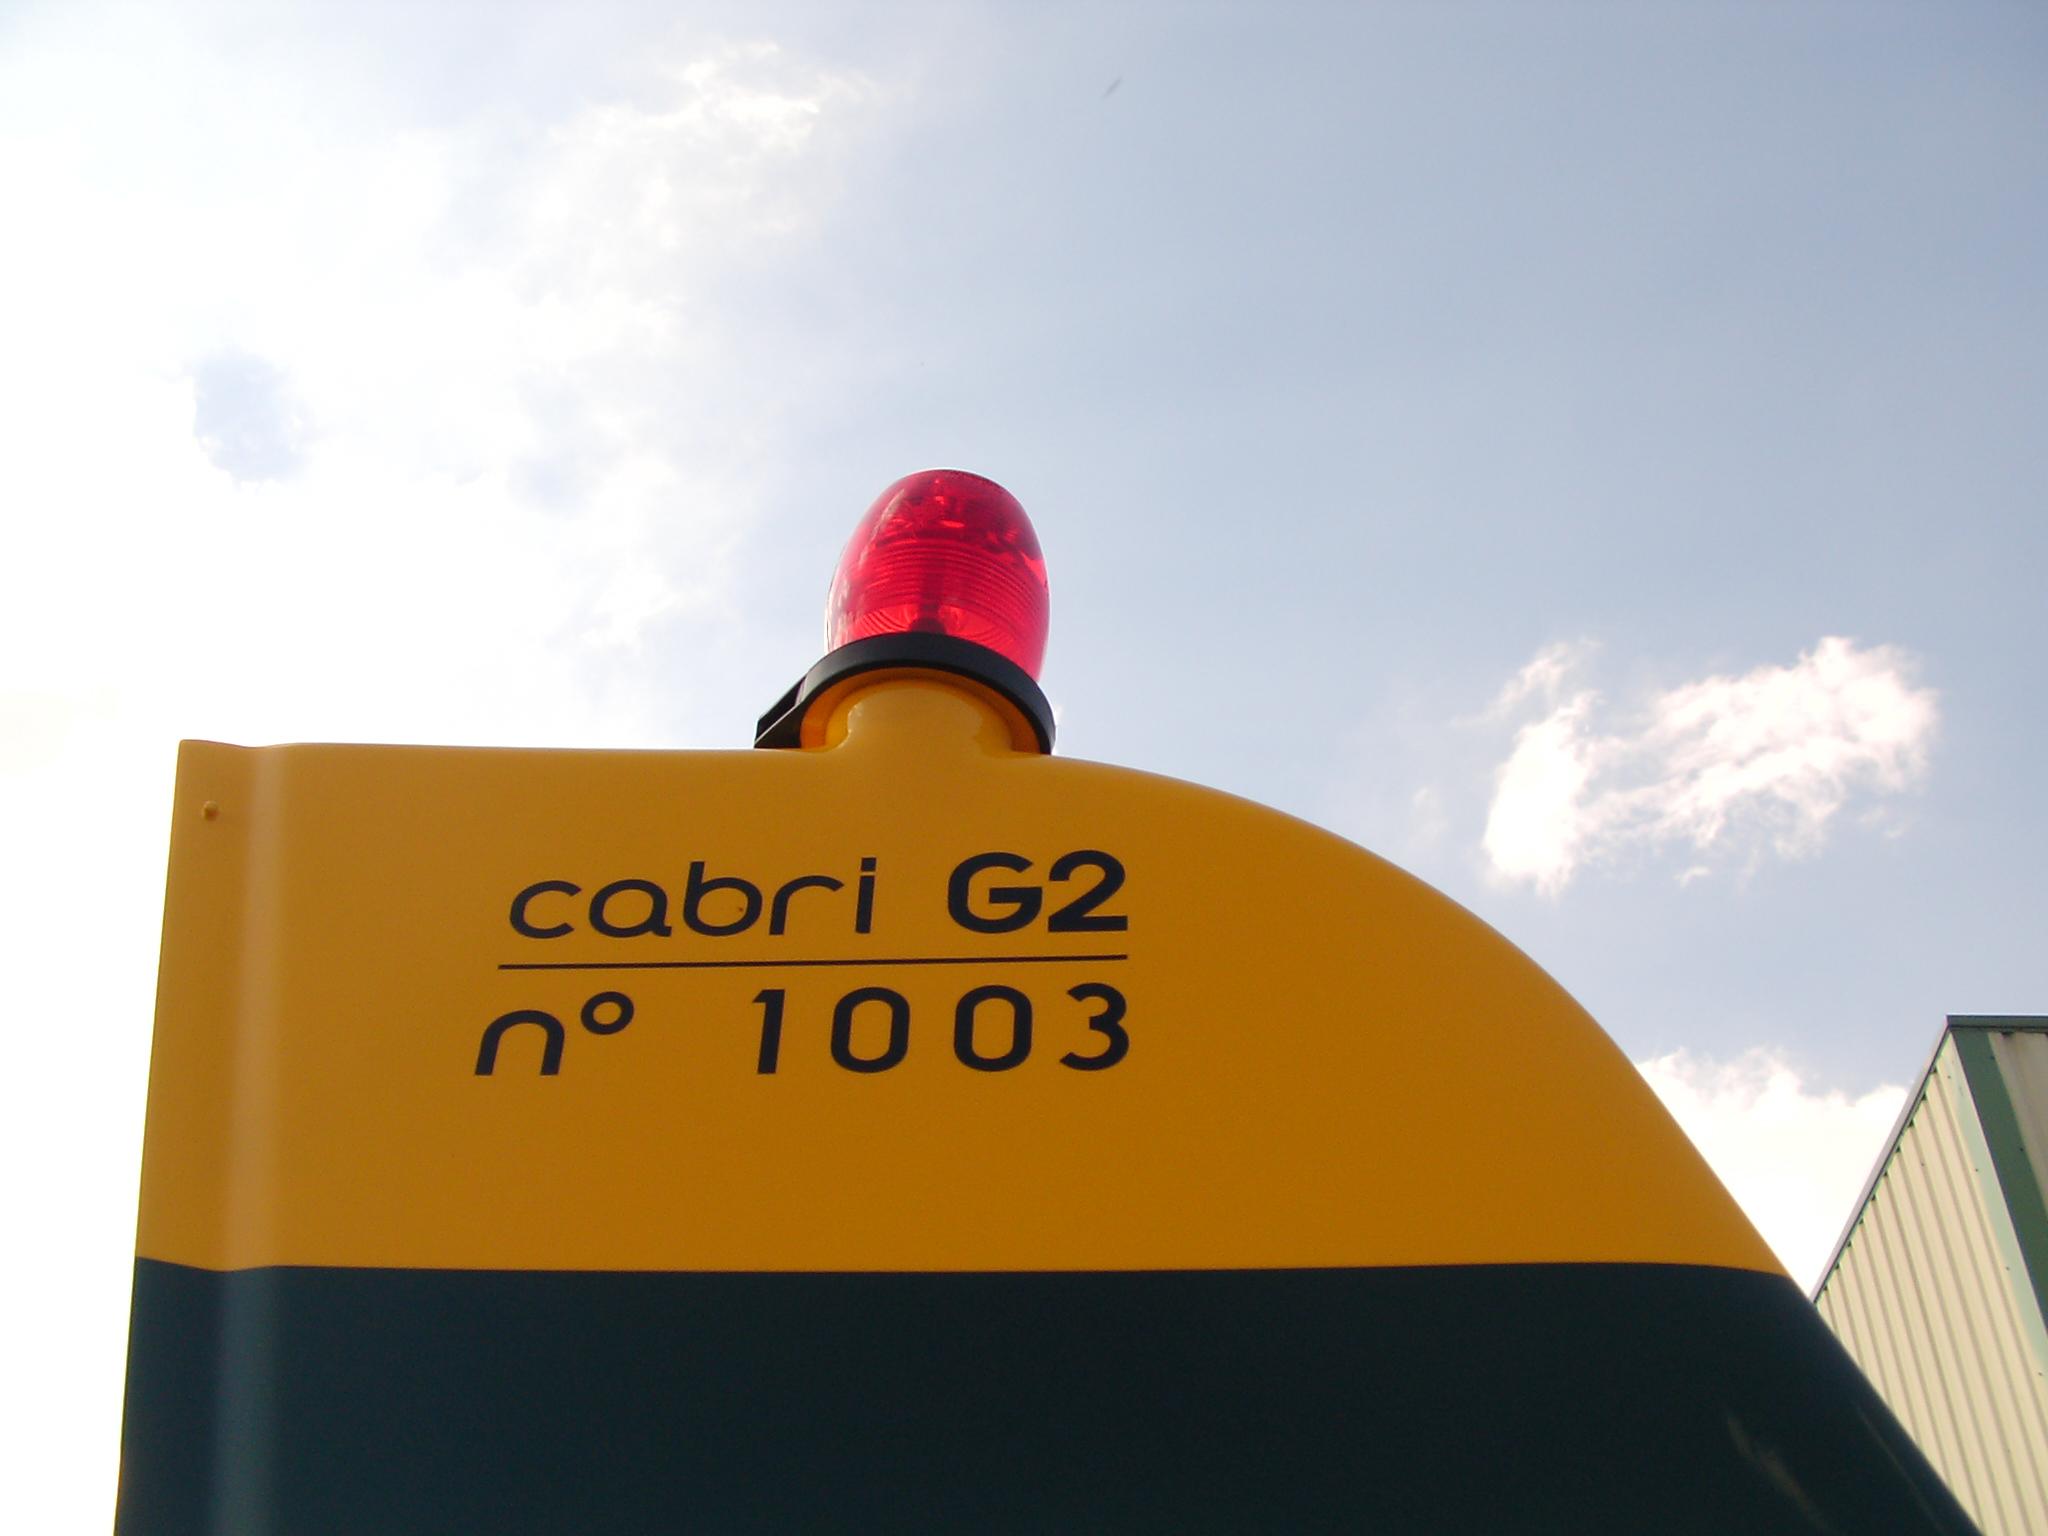 File:Guimbal Cabri G2 tail 1003.jpg